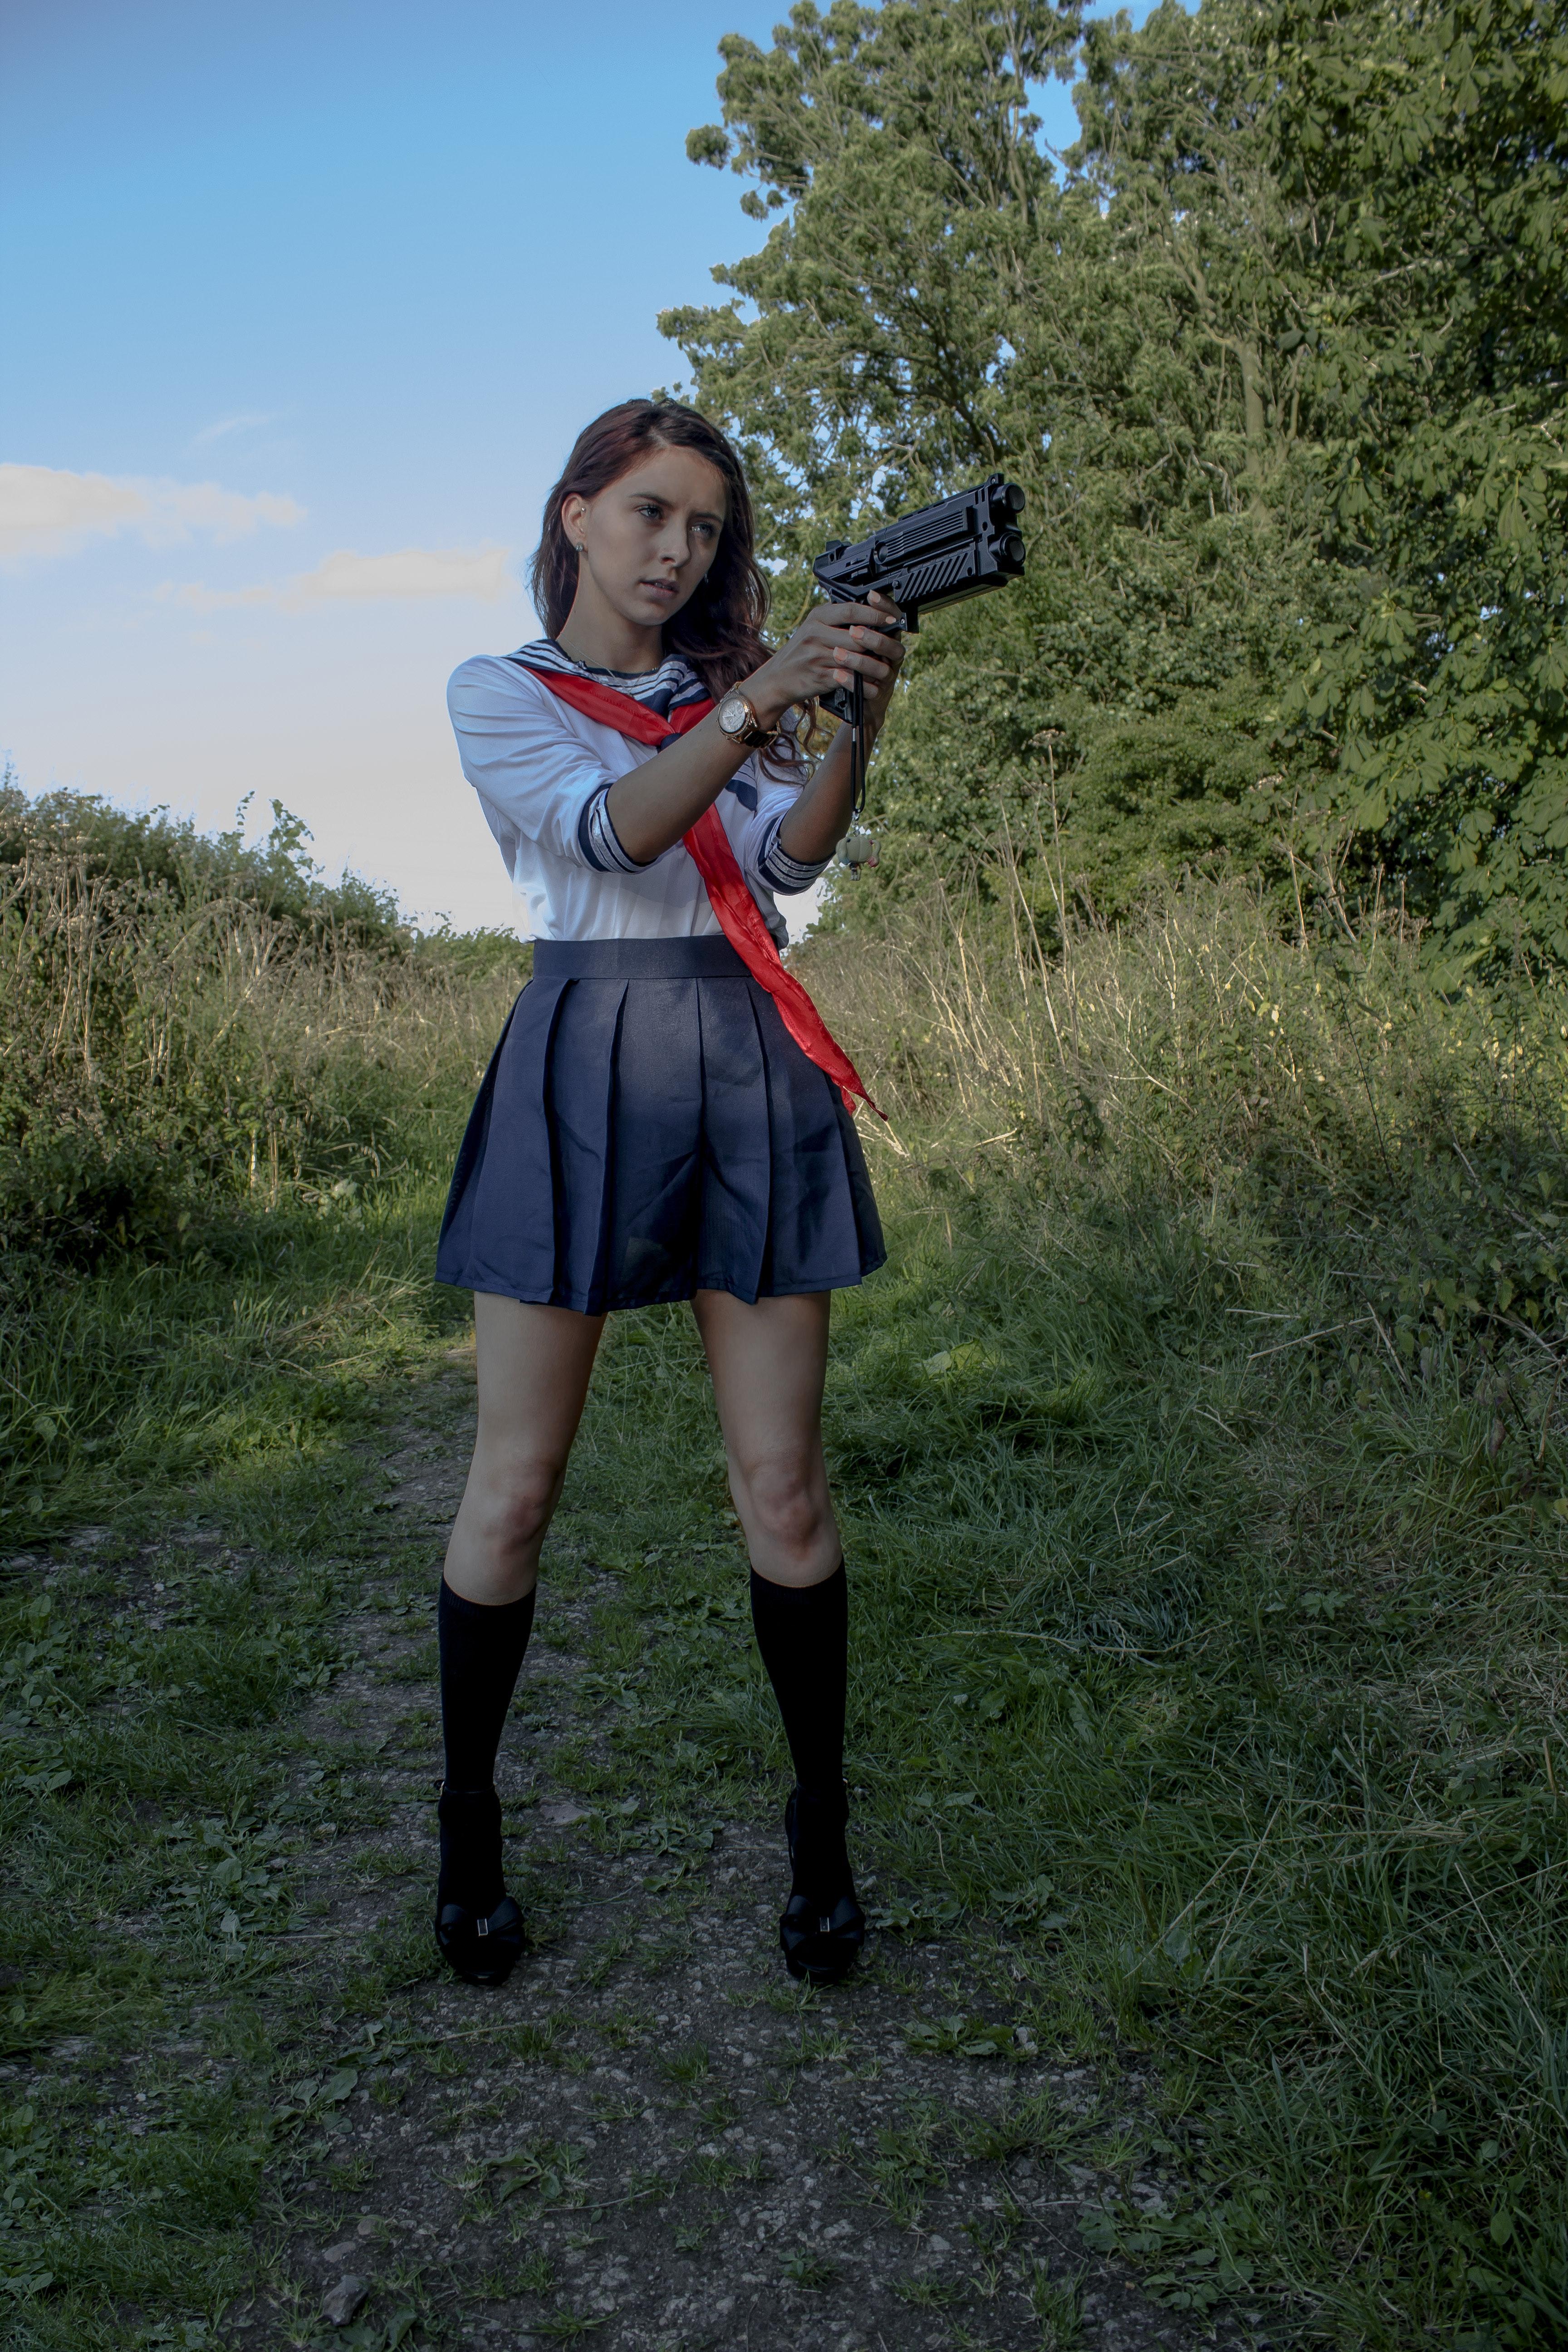 Gun Cosplay girl with